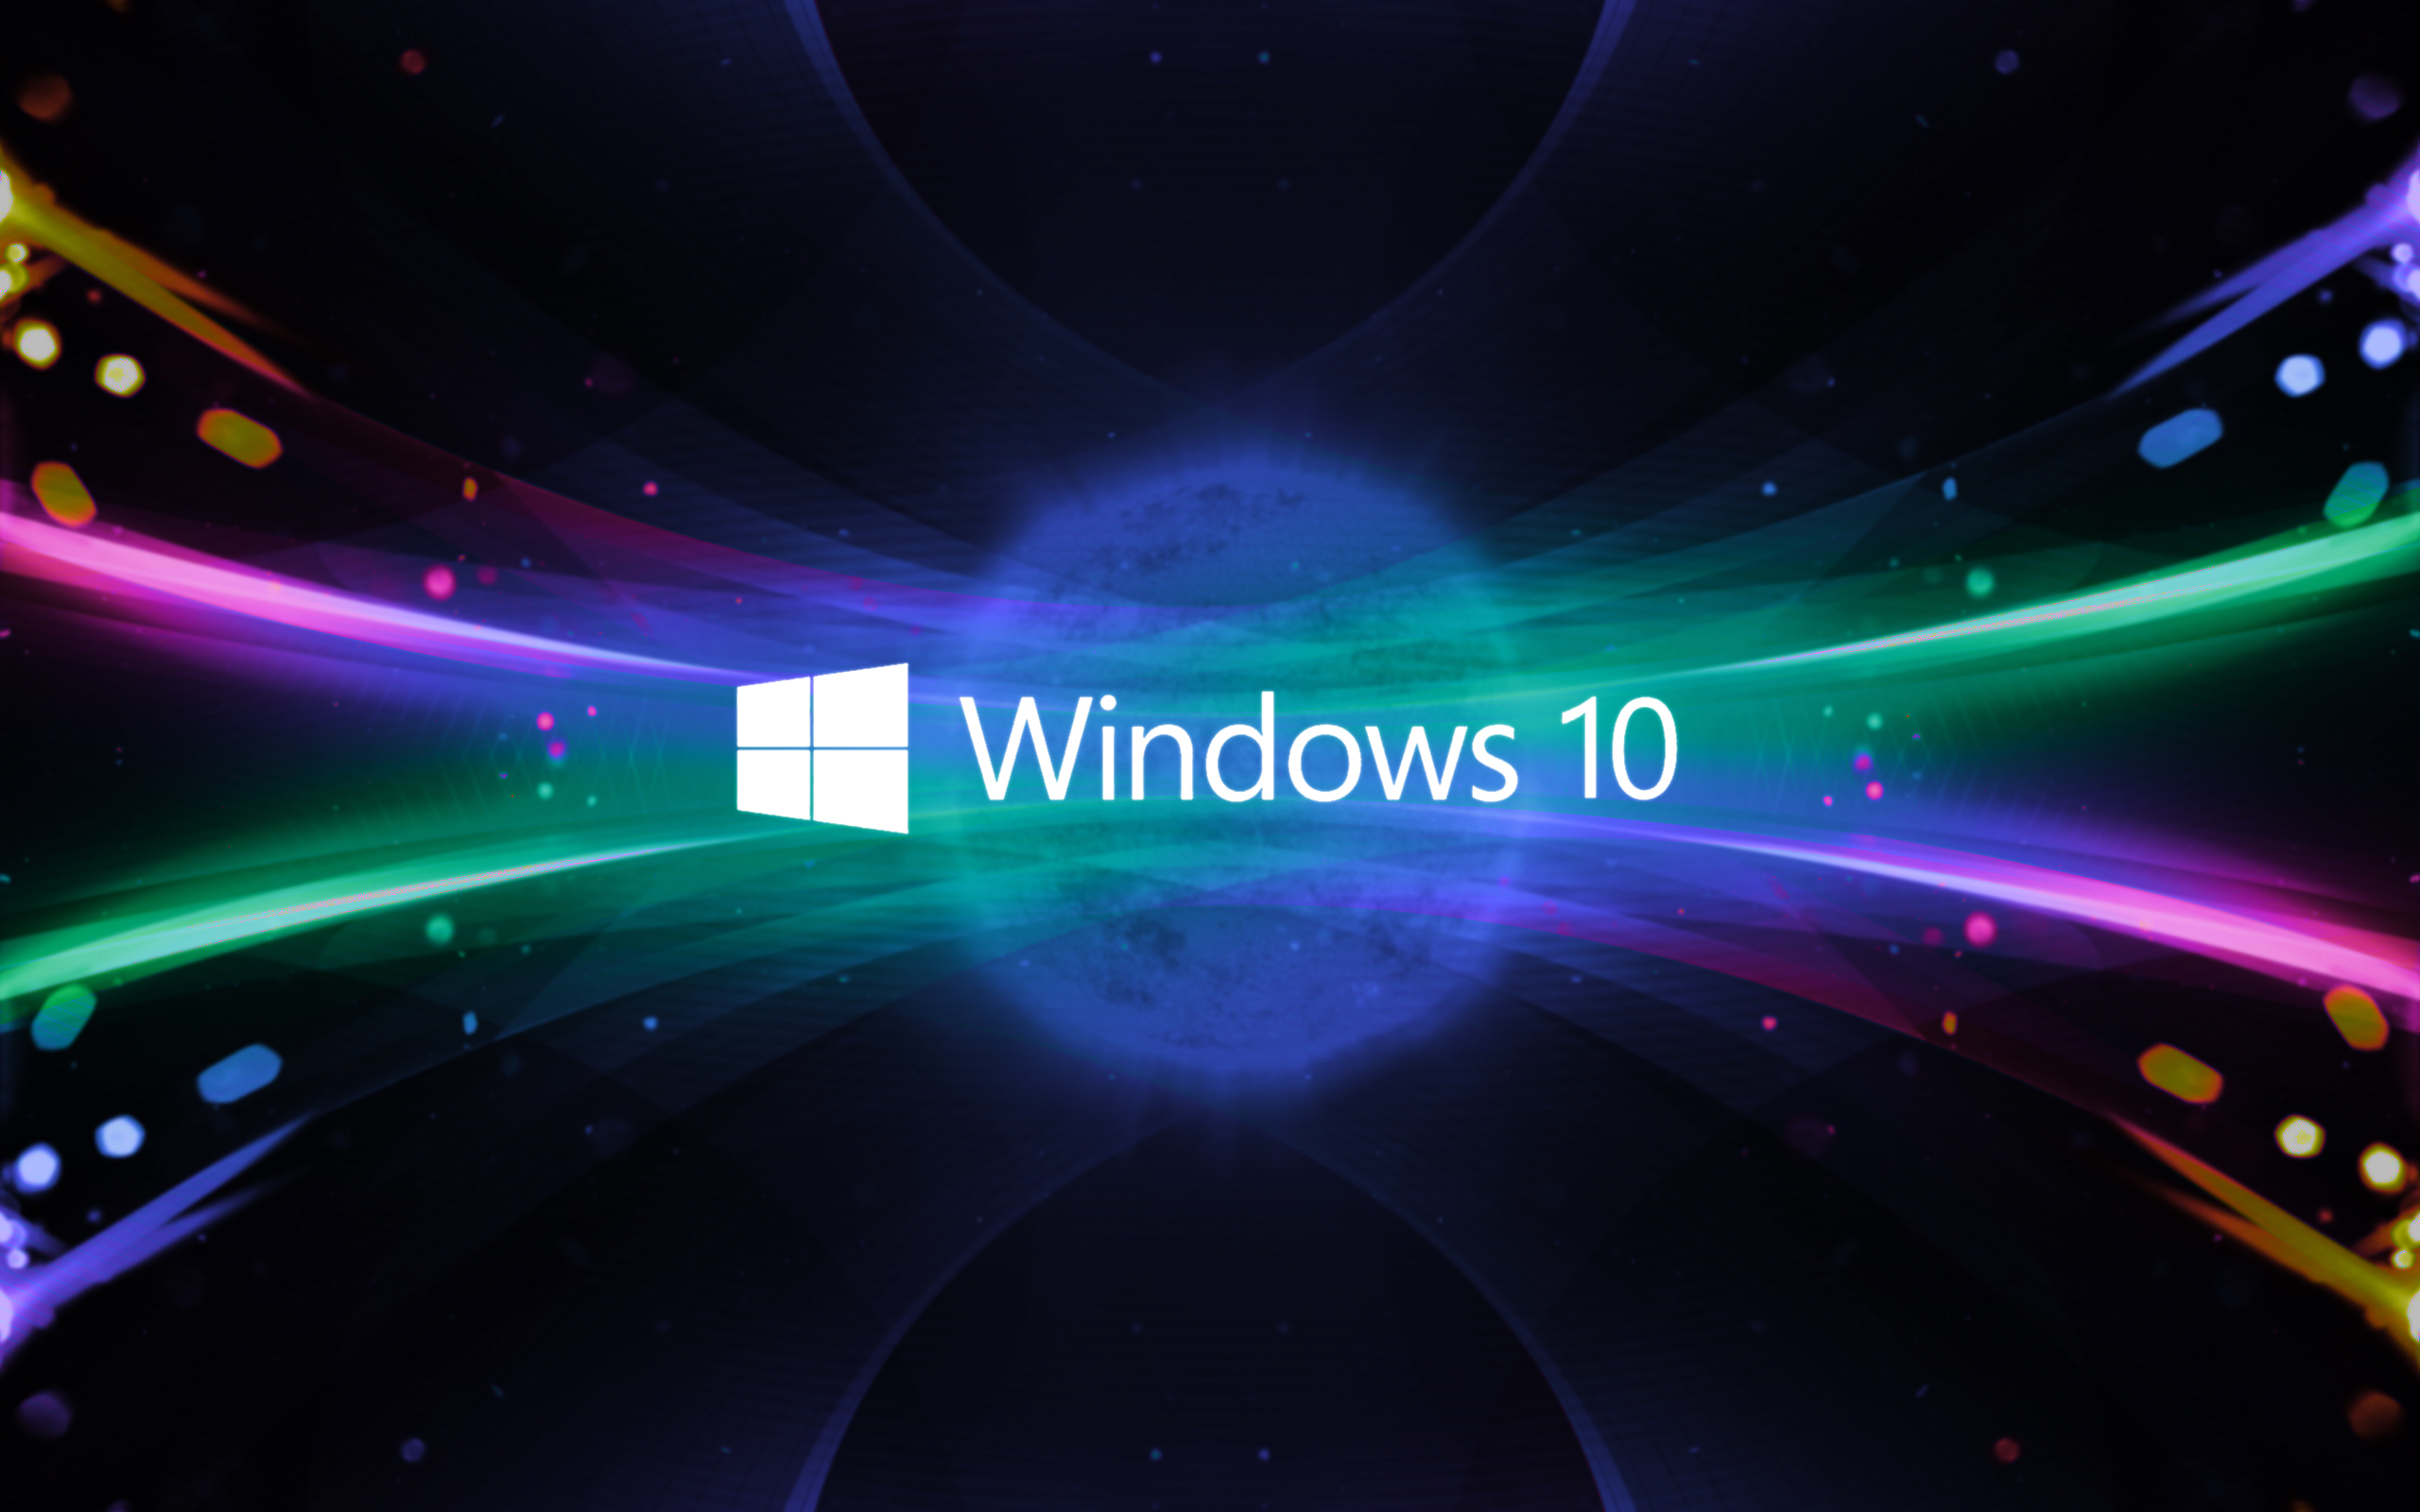 New Windows 10 Wallpaper Desktopjpg 2560x1600